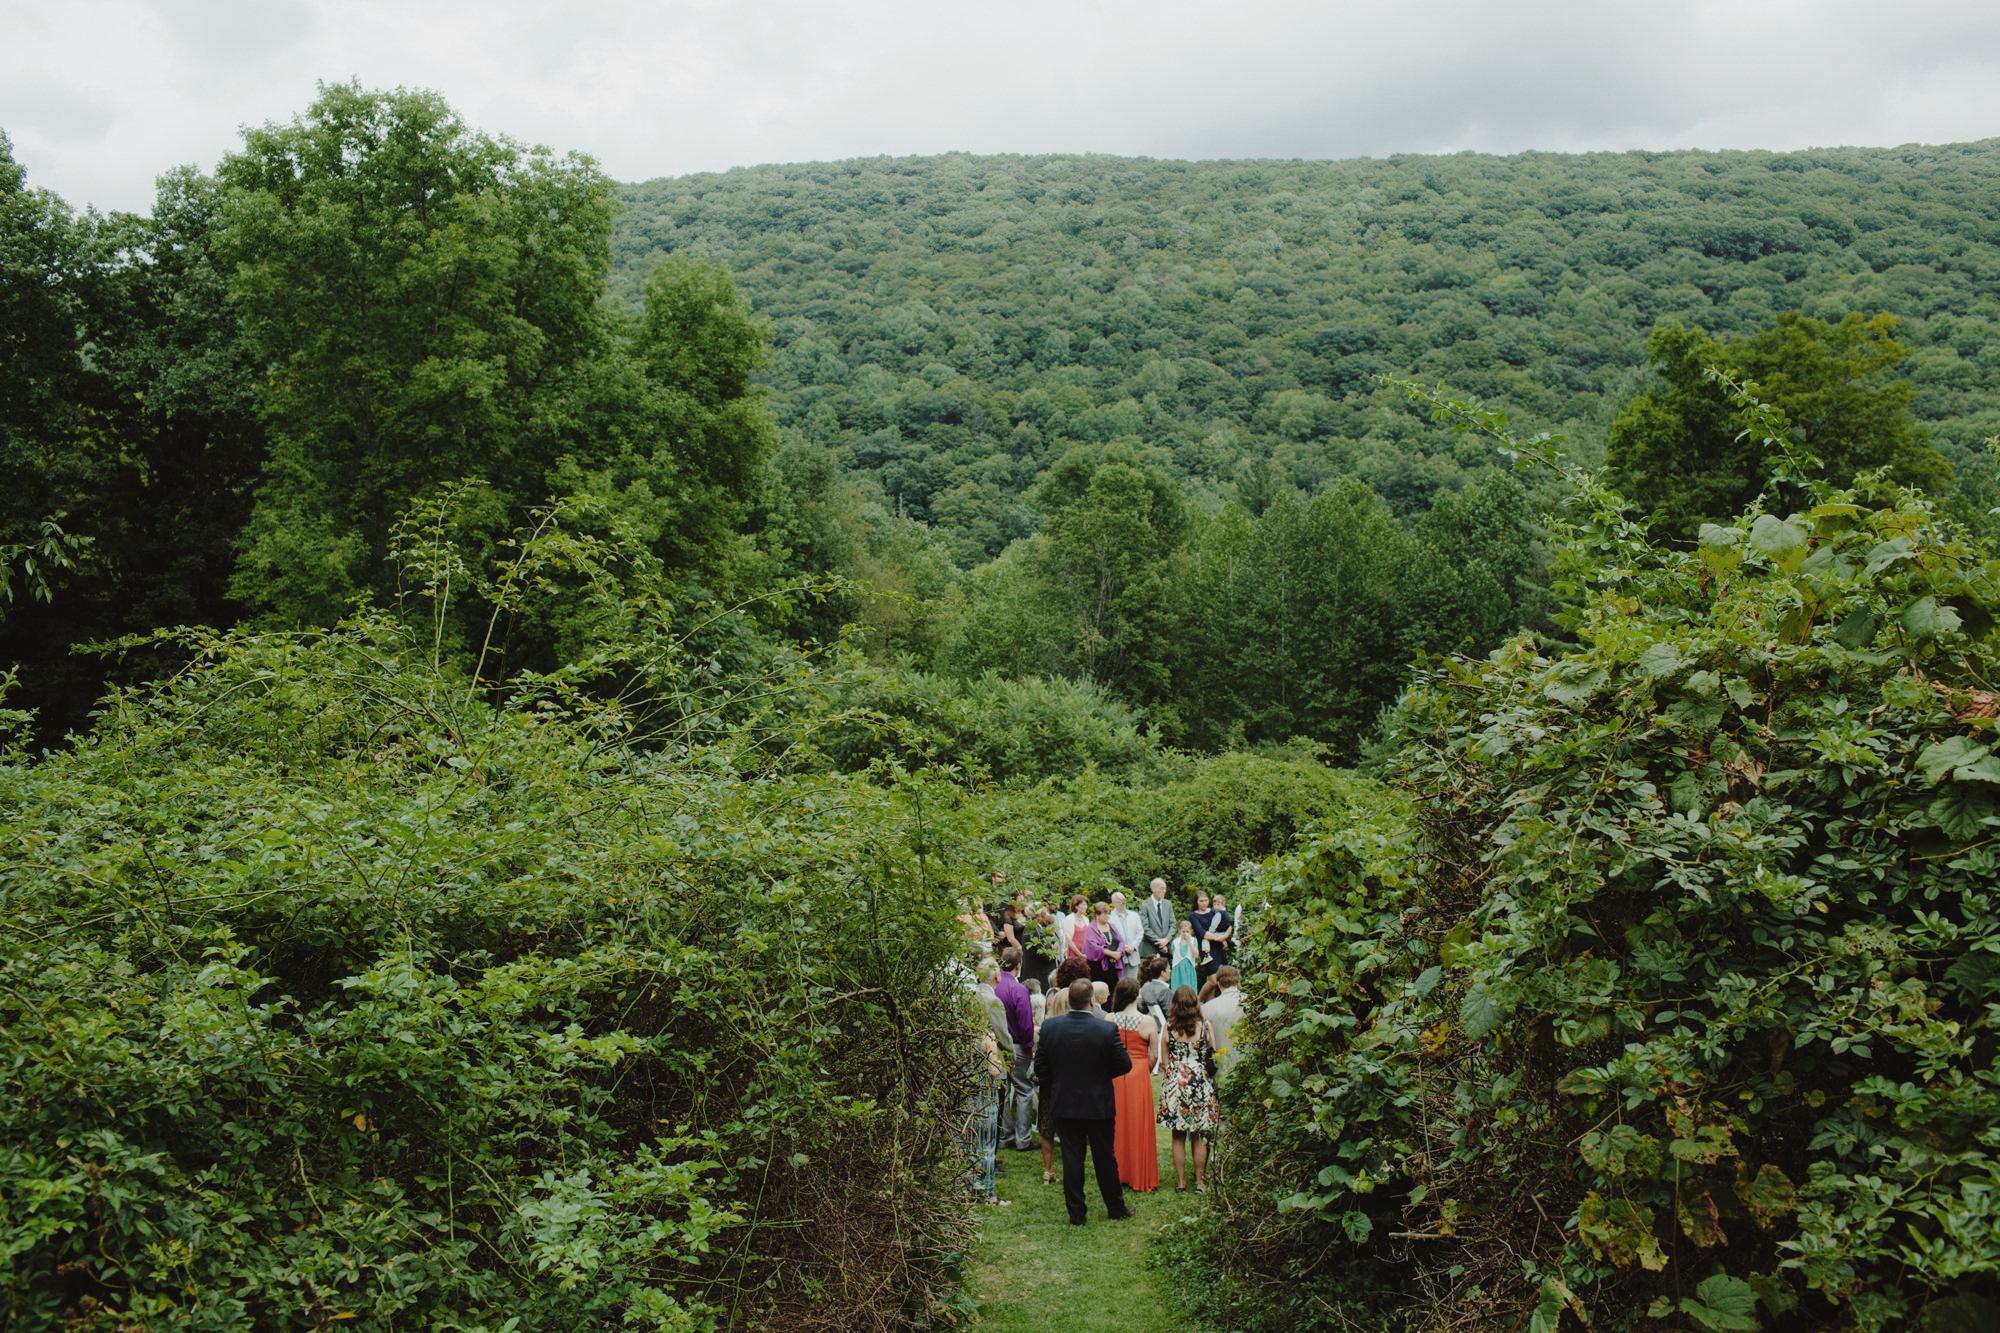 catskills_big_indian_springs_upstate_NY_wedding_sammblake054.jpg